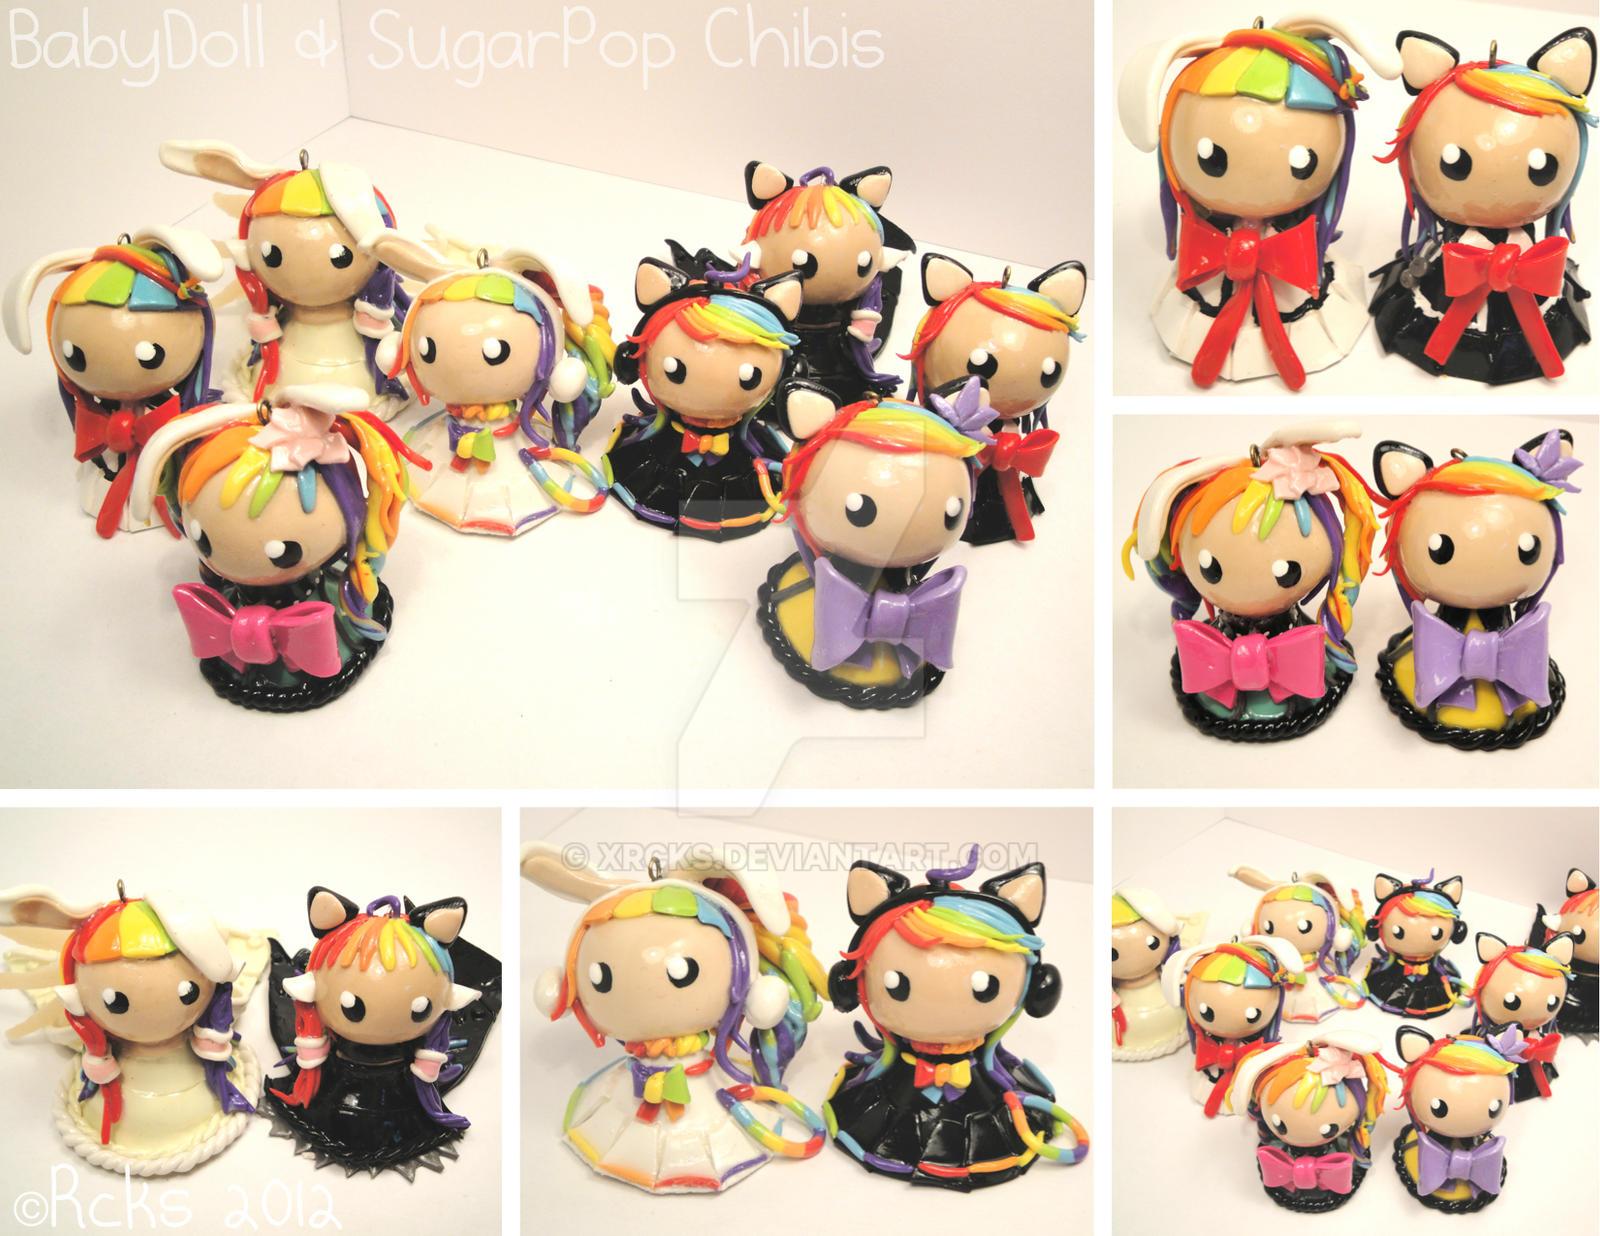 BabyDoll and SugarPop Cosplay Chibis by xRcks